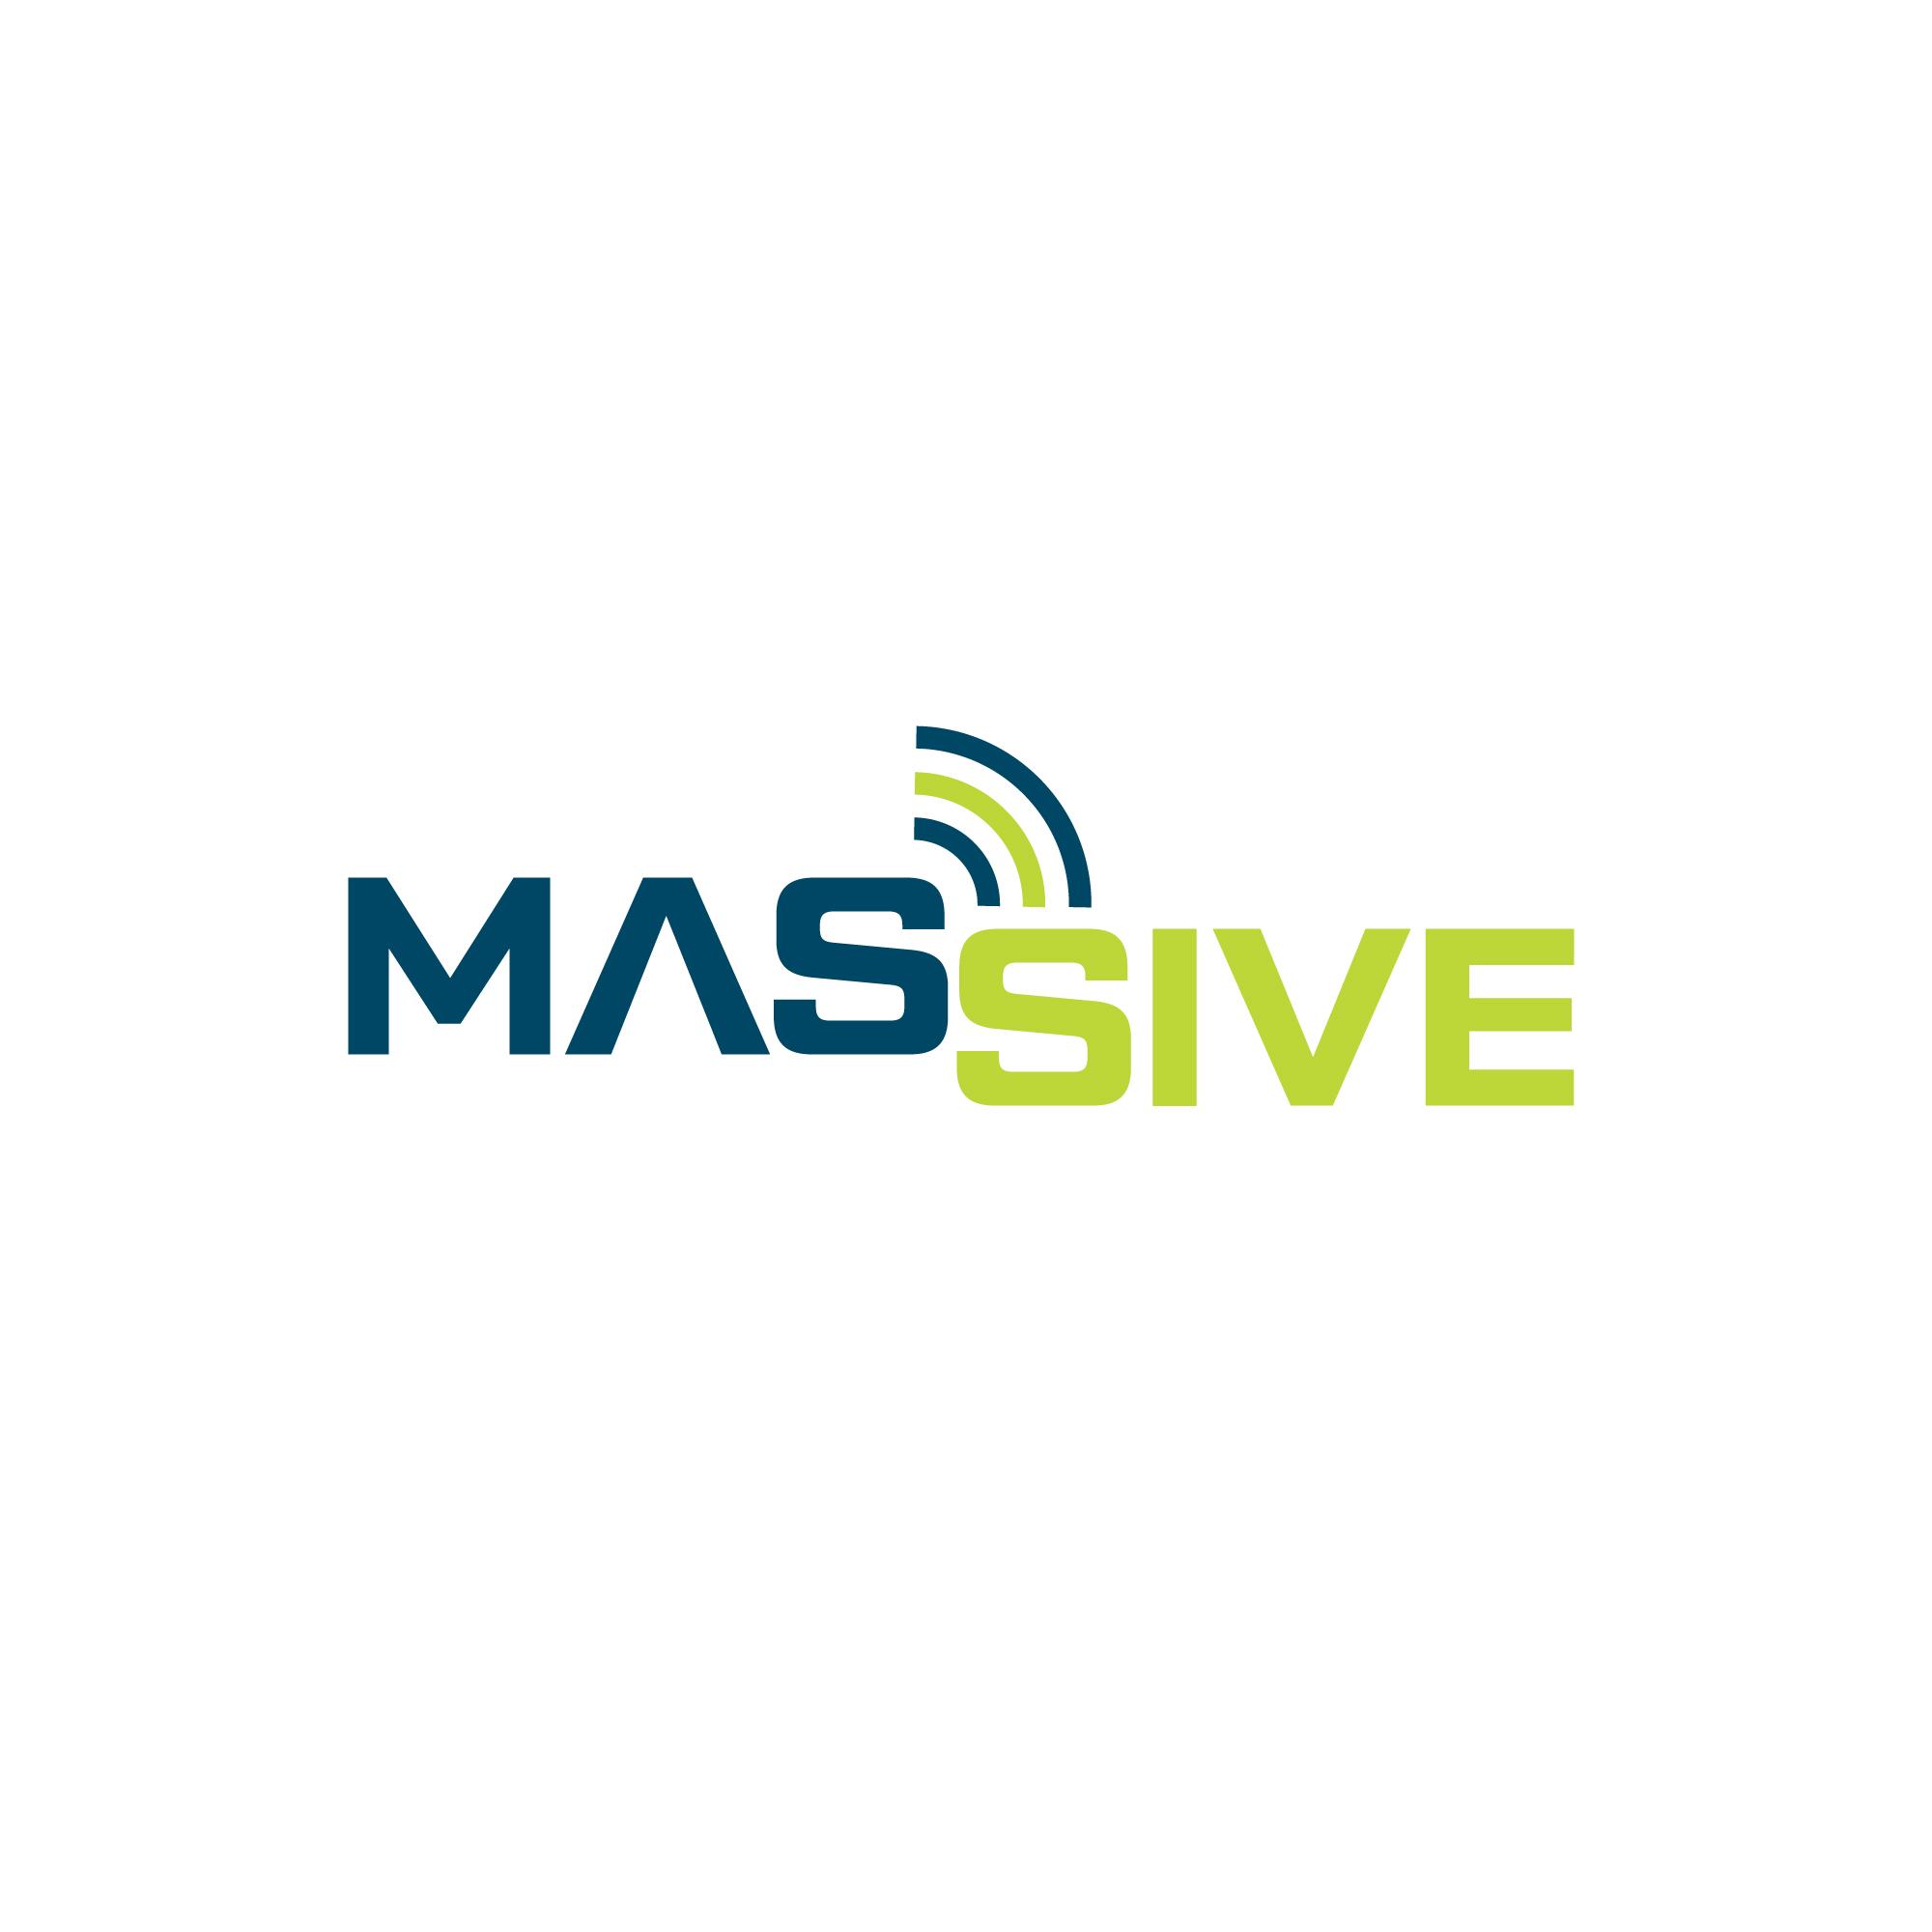 Logo Design by Zoran Lesevic - Entry No. 413 in the Logo Design Contest MASSIVE LOGO.